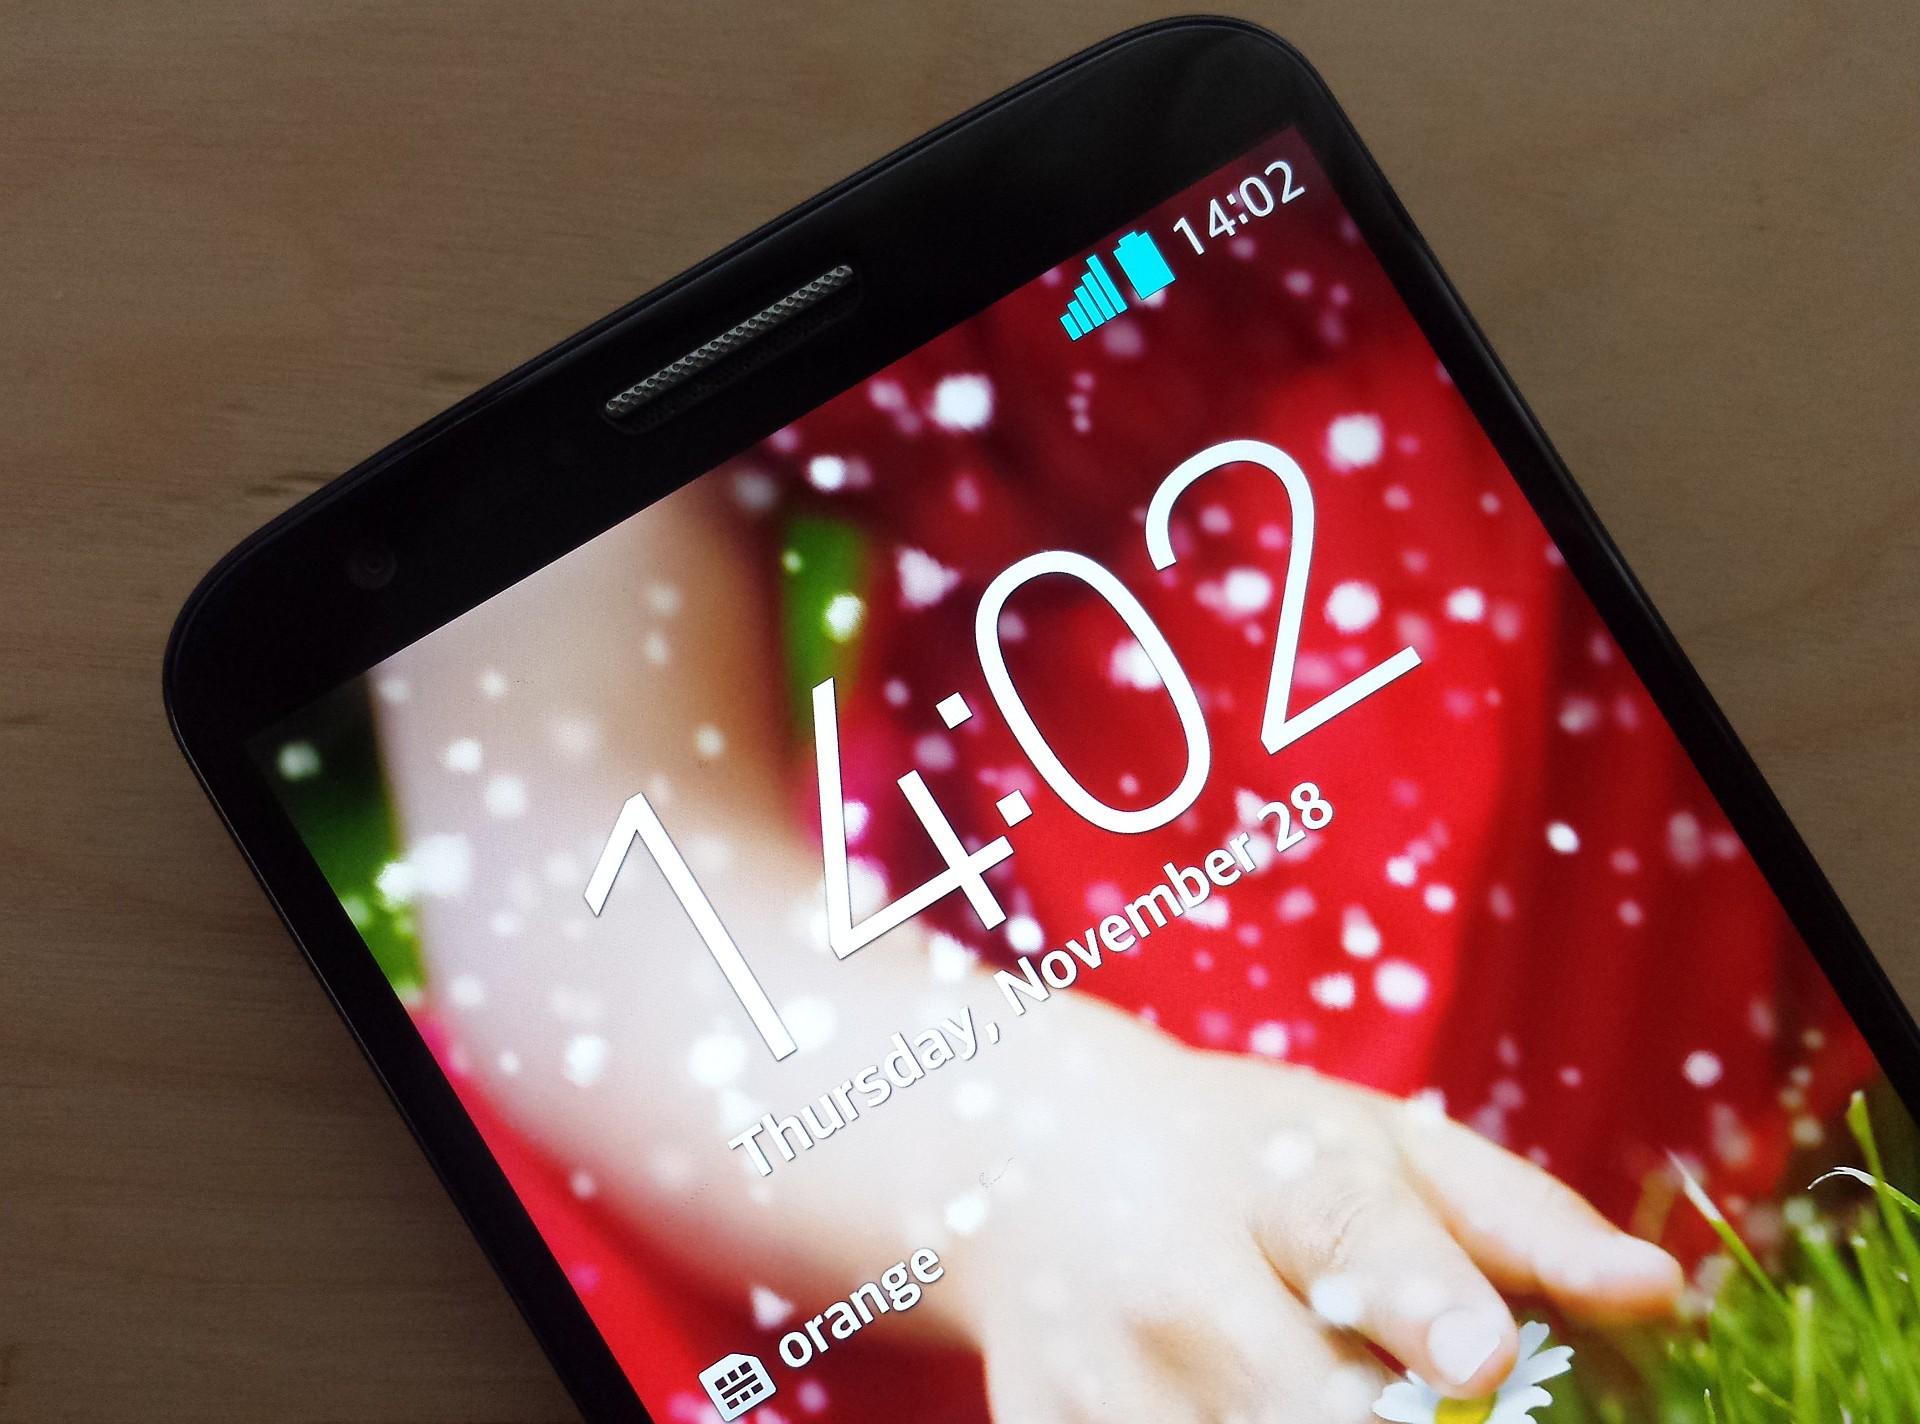 LG G2, cu bune și cu rele – un model de progres [REVIEW]